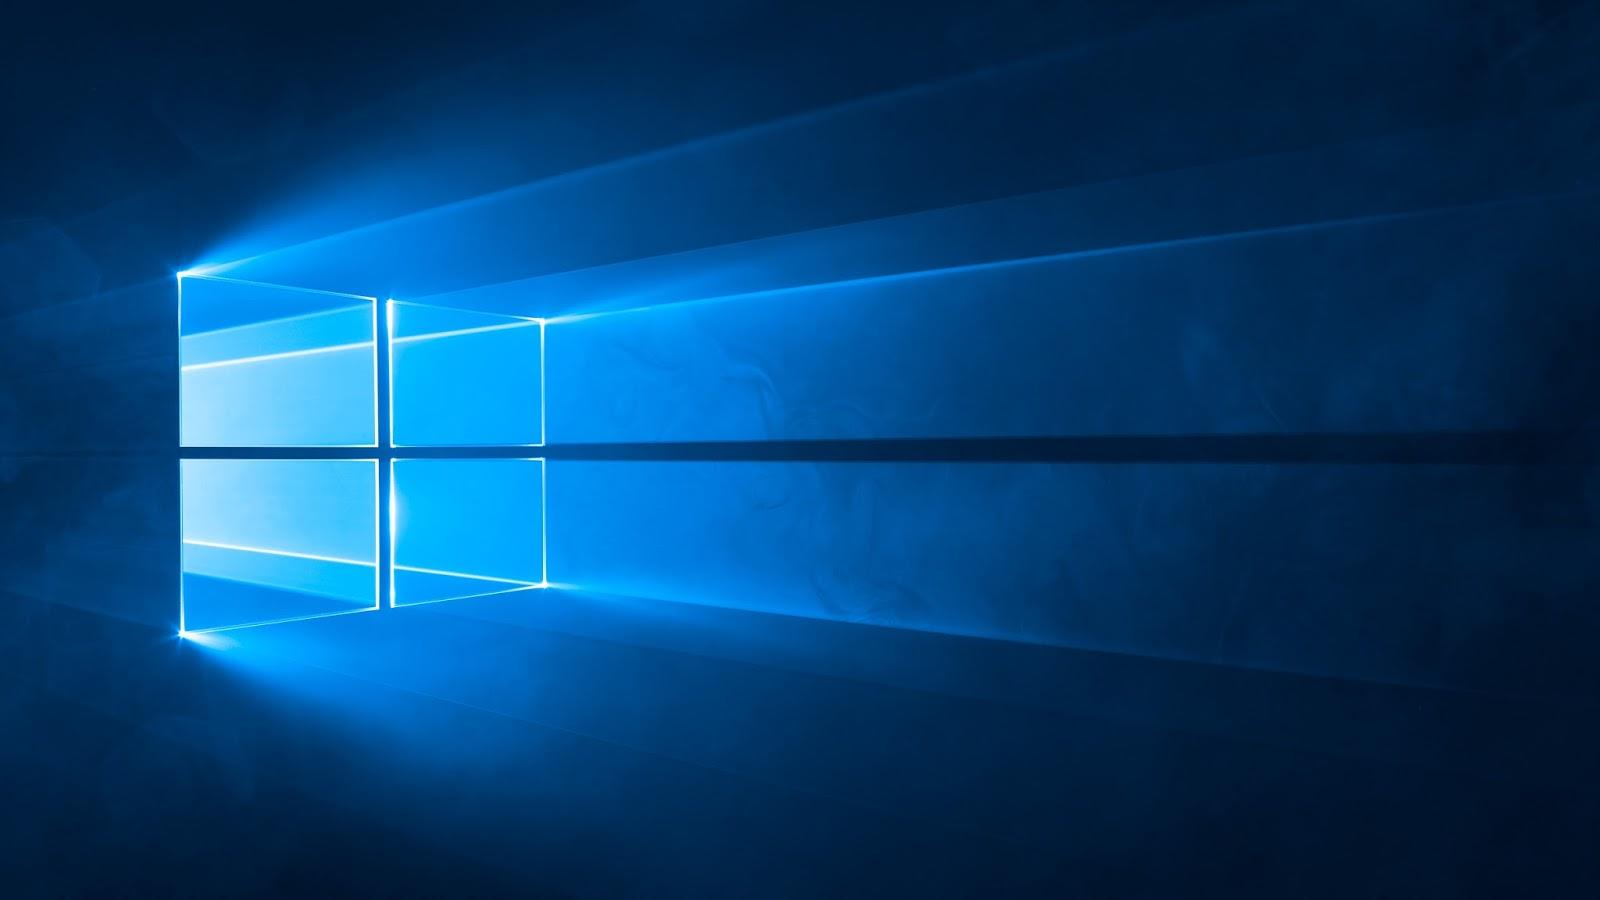 Wallpapers Calendars Microsoft Windows 10 Download wallpaper 1600x900